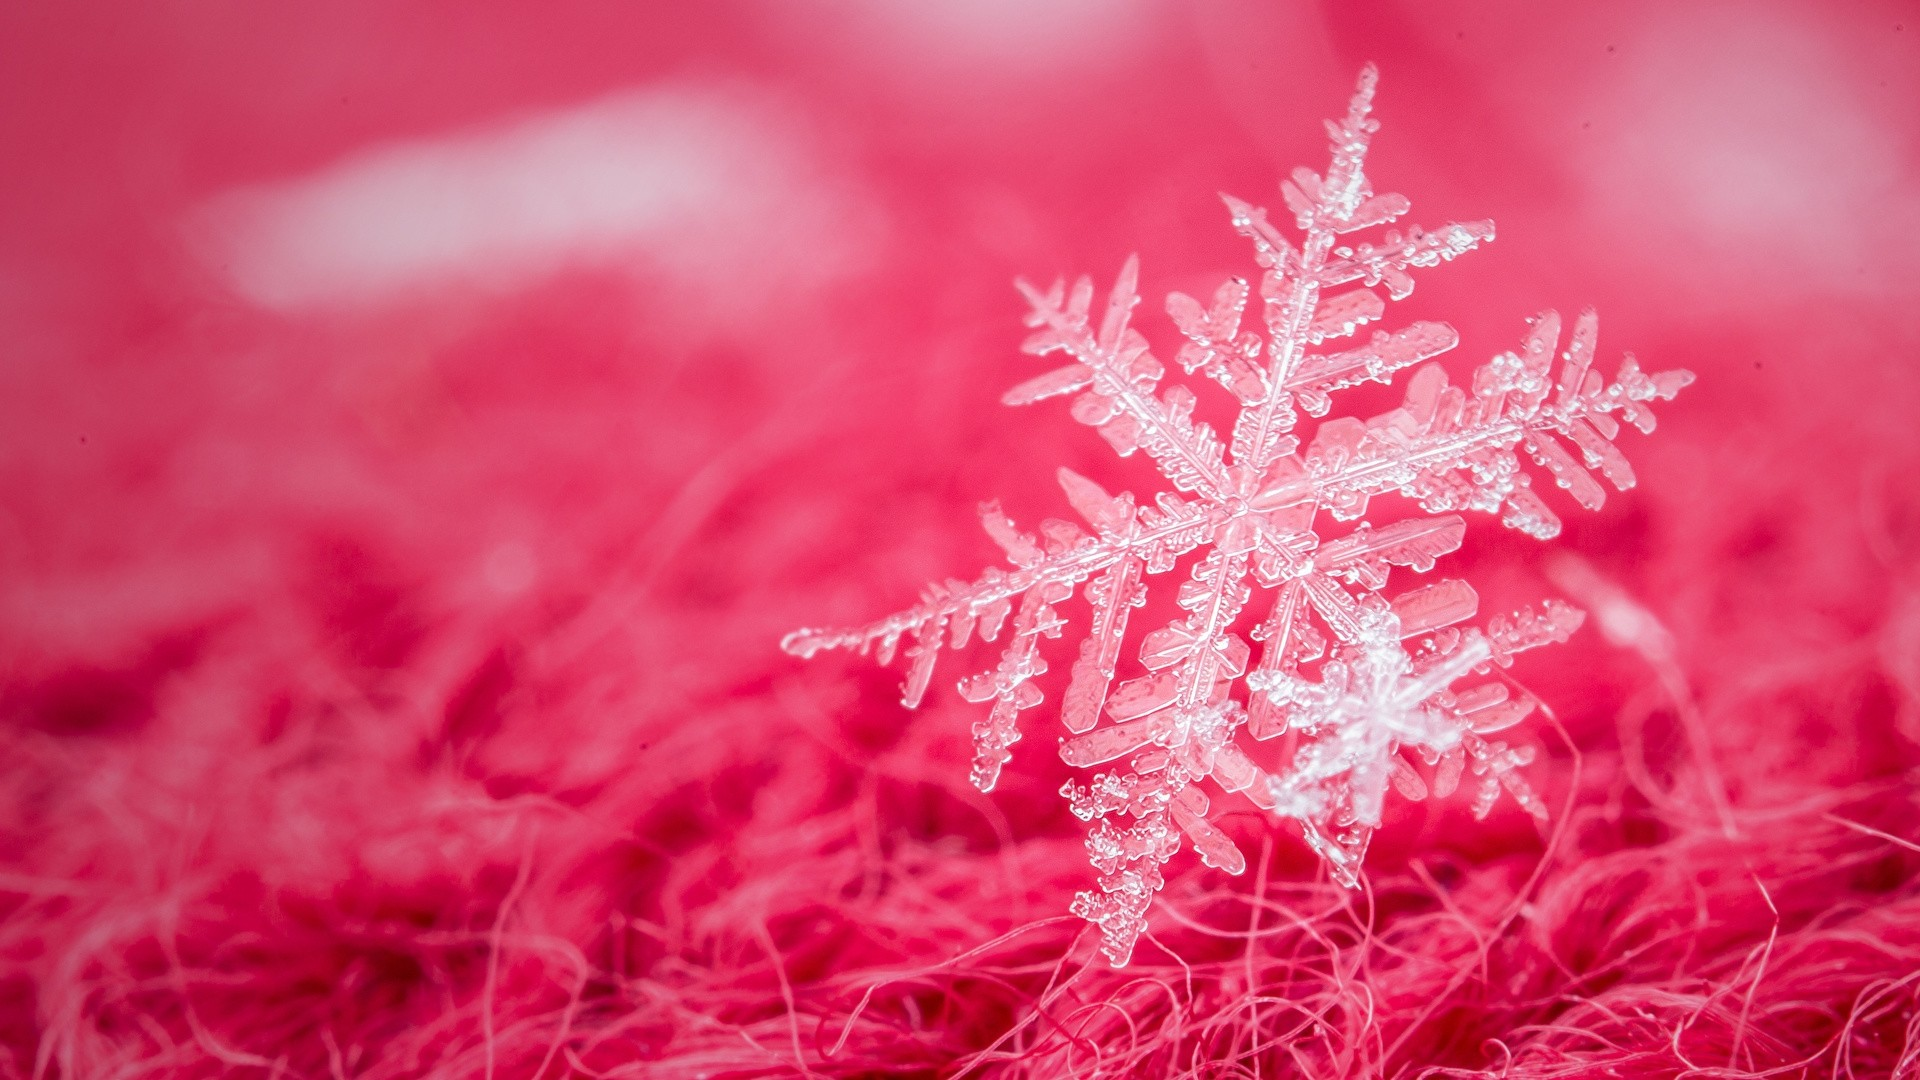 Snowflake Wallpaper Free Download